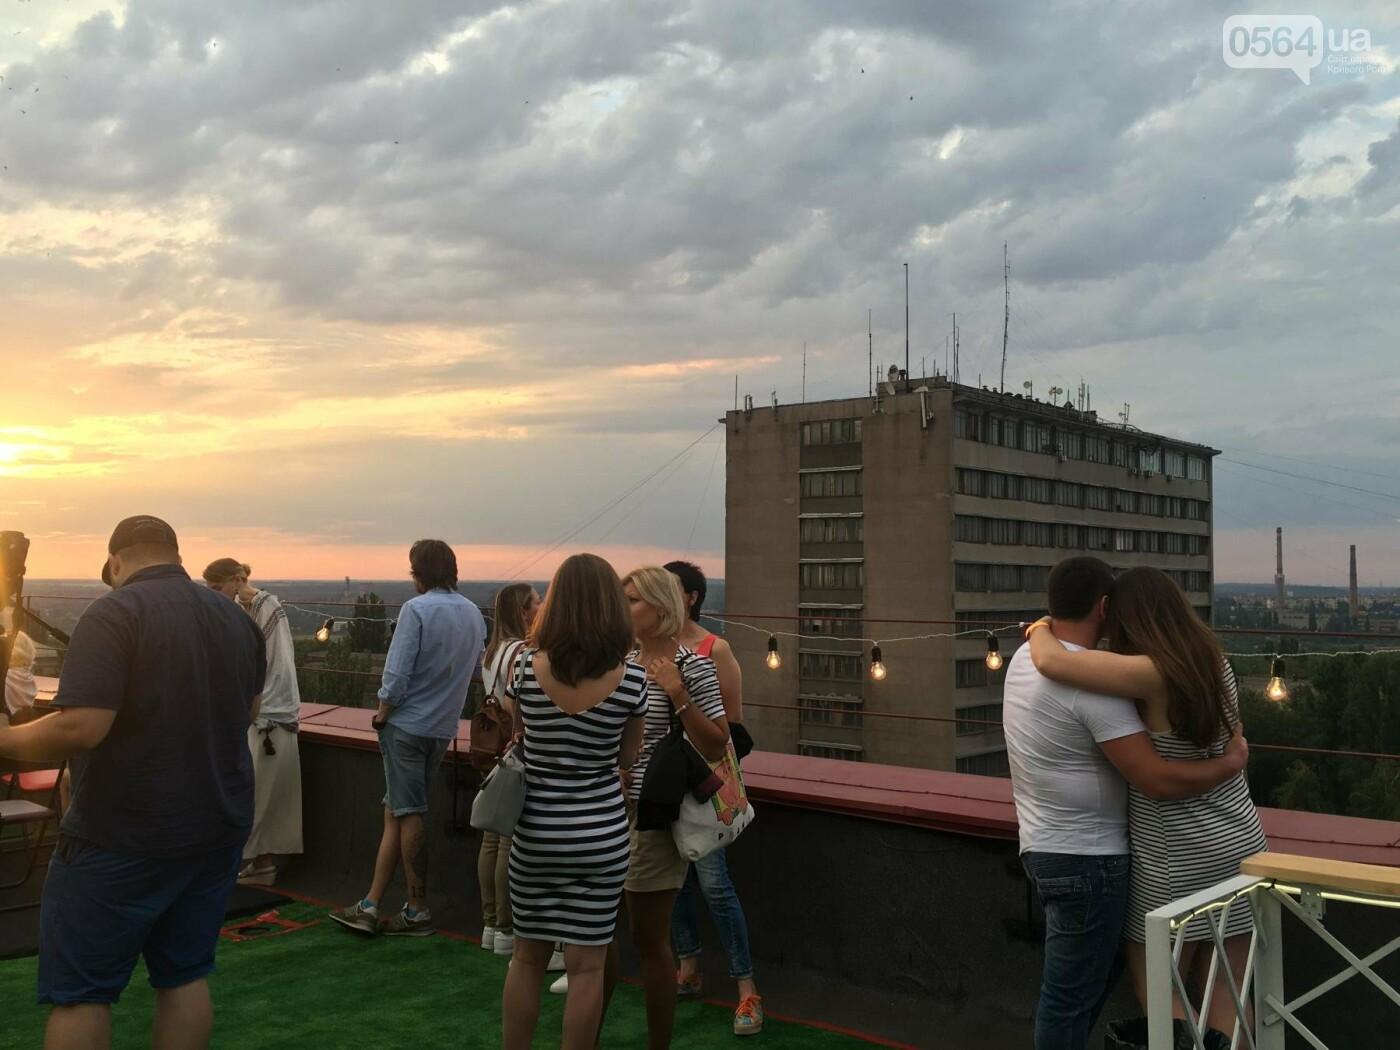 Сотни криворожан встречали закат на крыше отеля под мелодии джаза, - ФОТО, ВИДЕО, фото-34